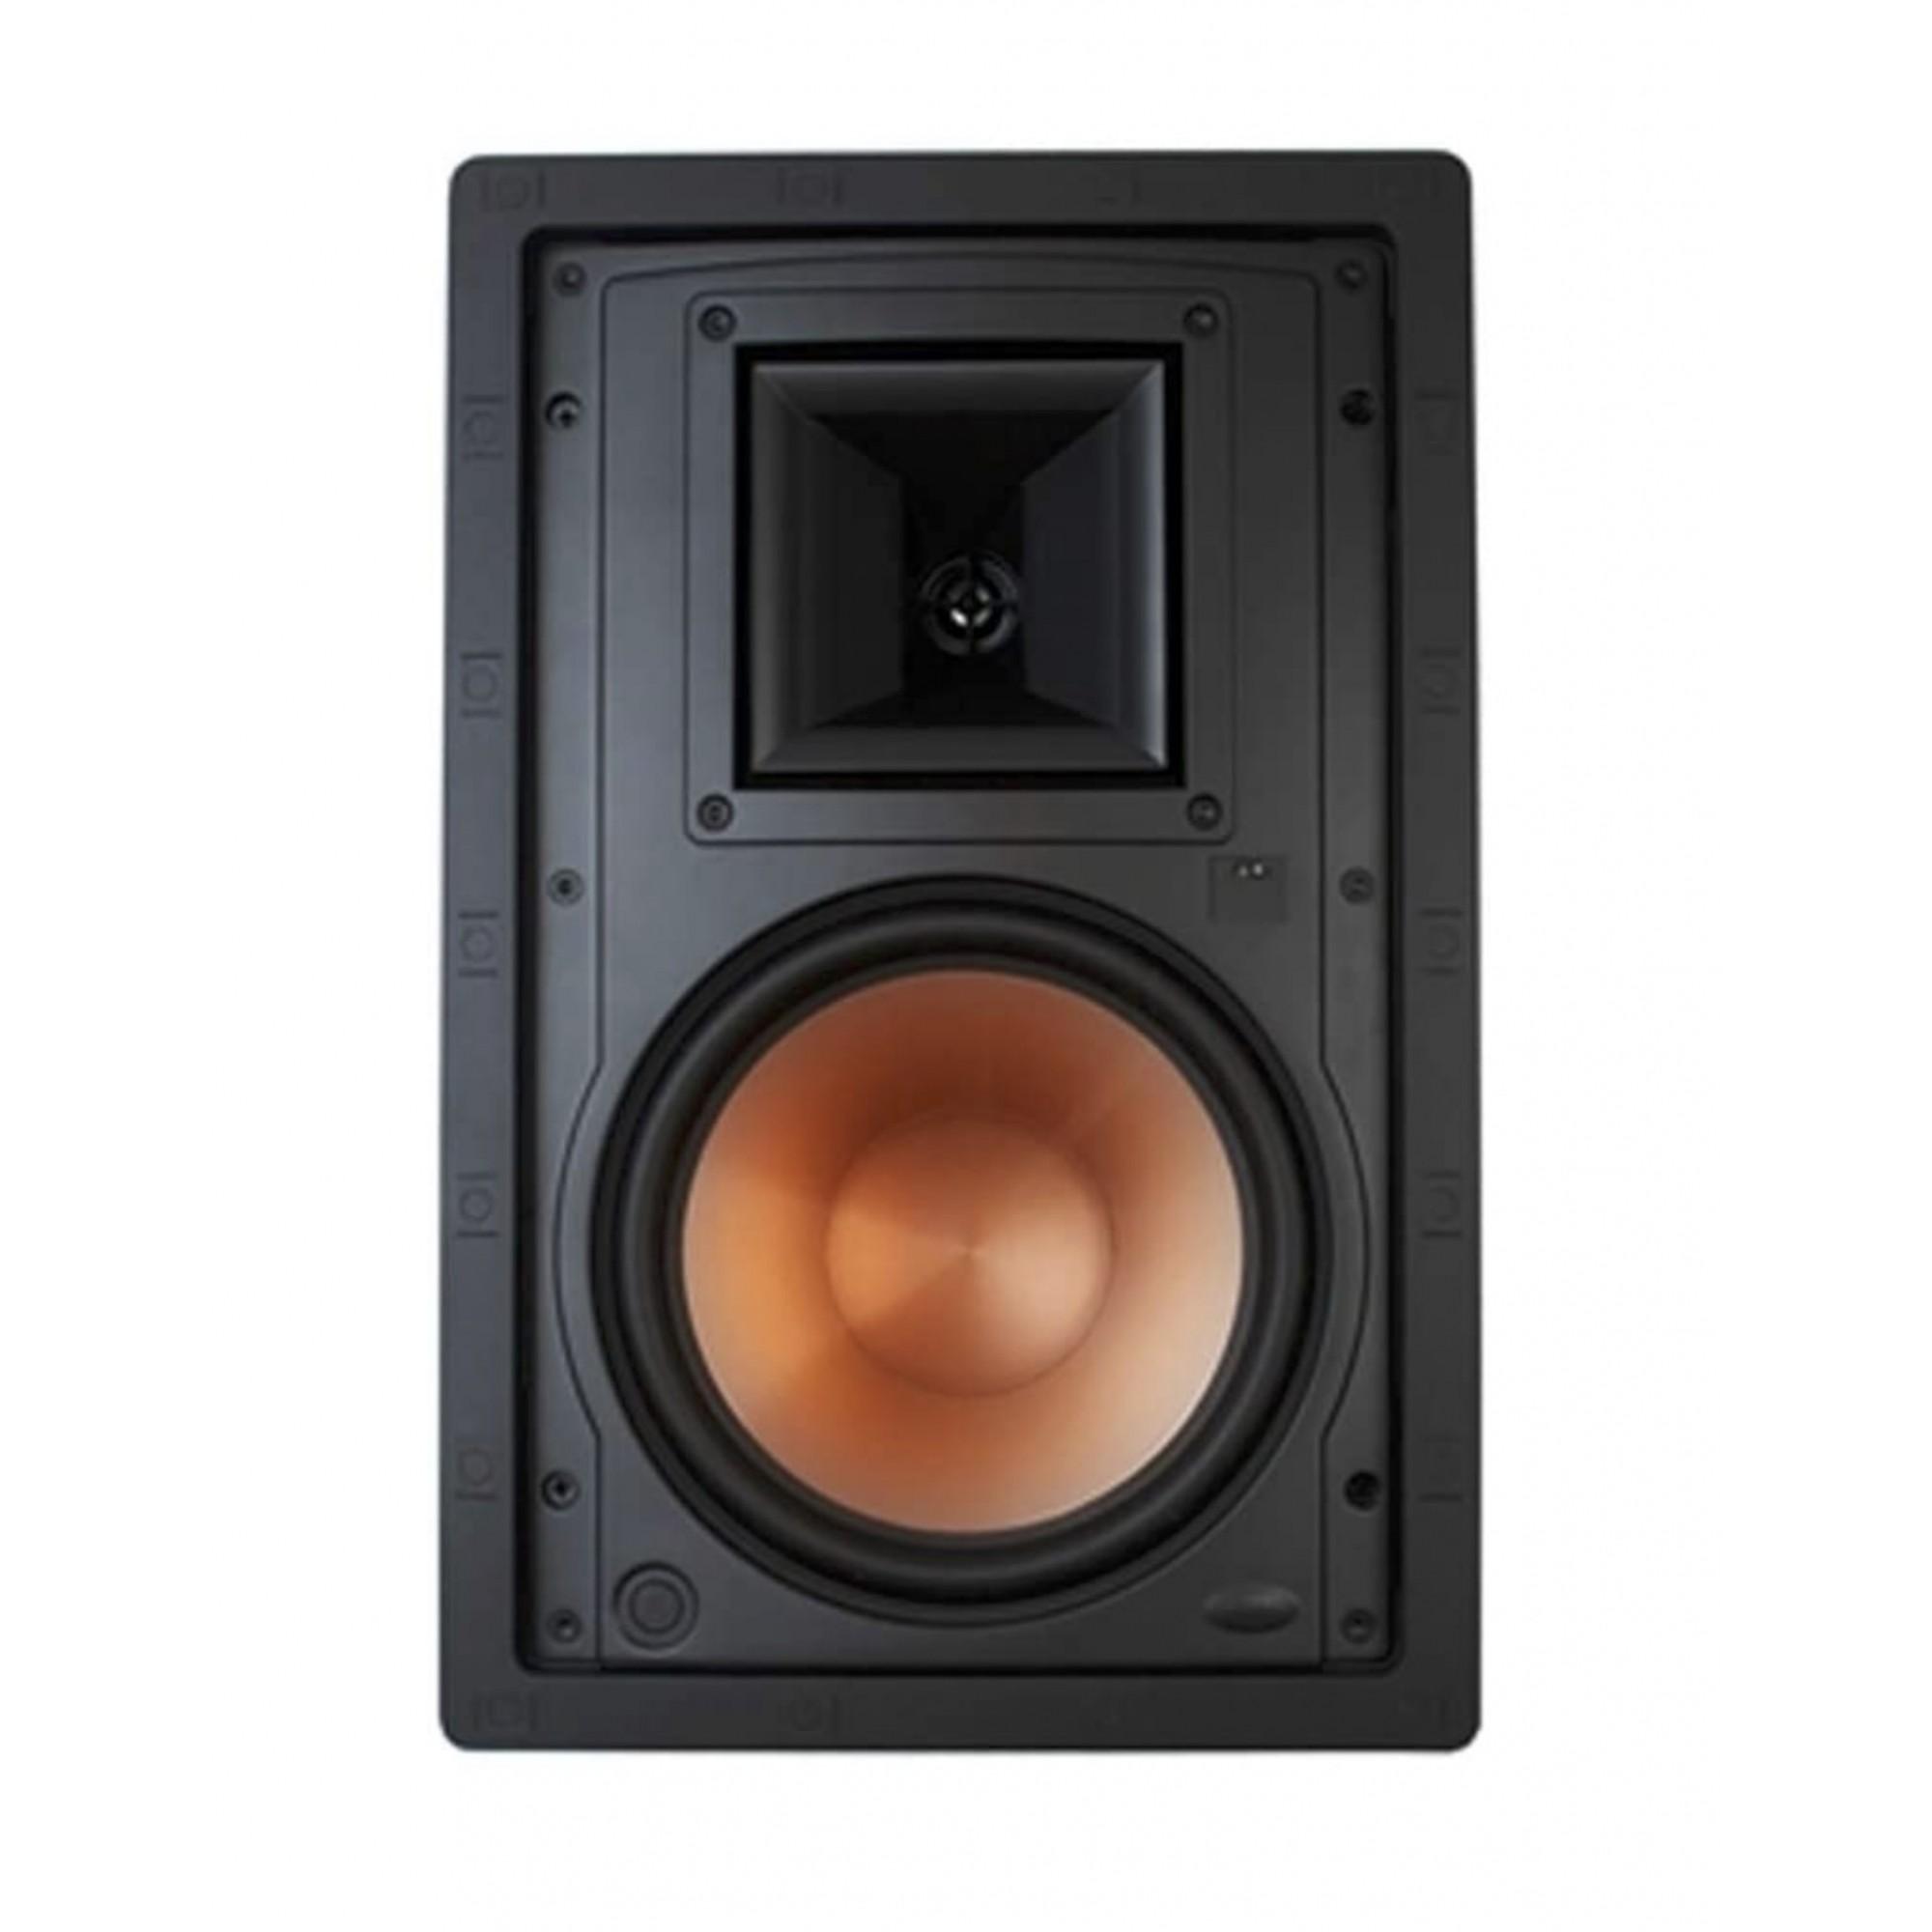 Klipsch R-3800-W II In-Wall  Caixa Acústica Embutir  1 Unidade